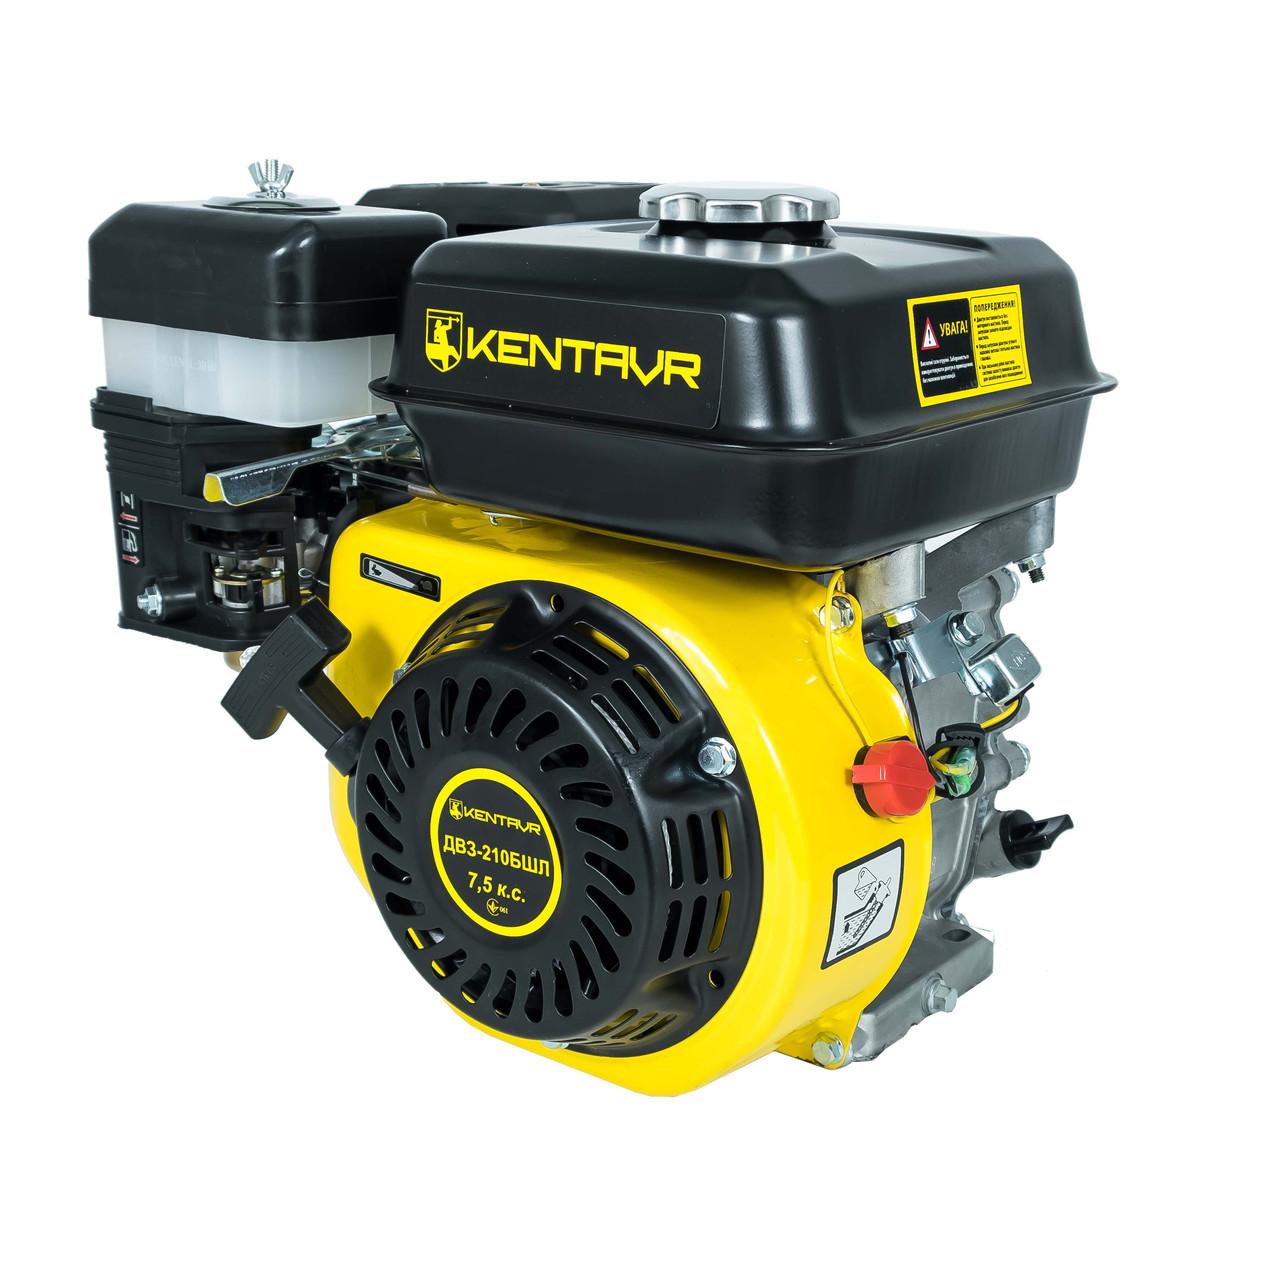 Двигун бензиновий Кентавр ДВЗ-210БШЛ (7,5 л. с., шліц, вал 25мм)